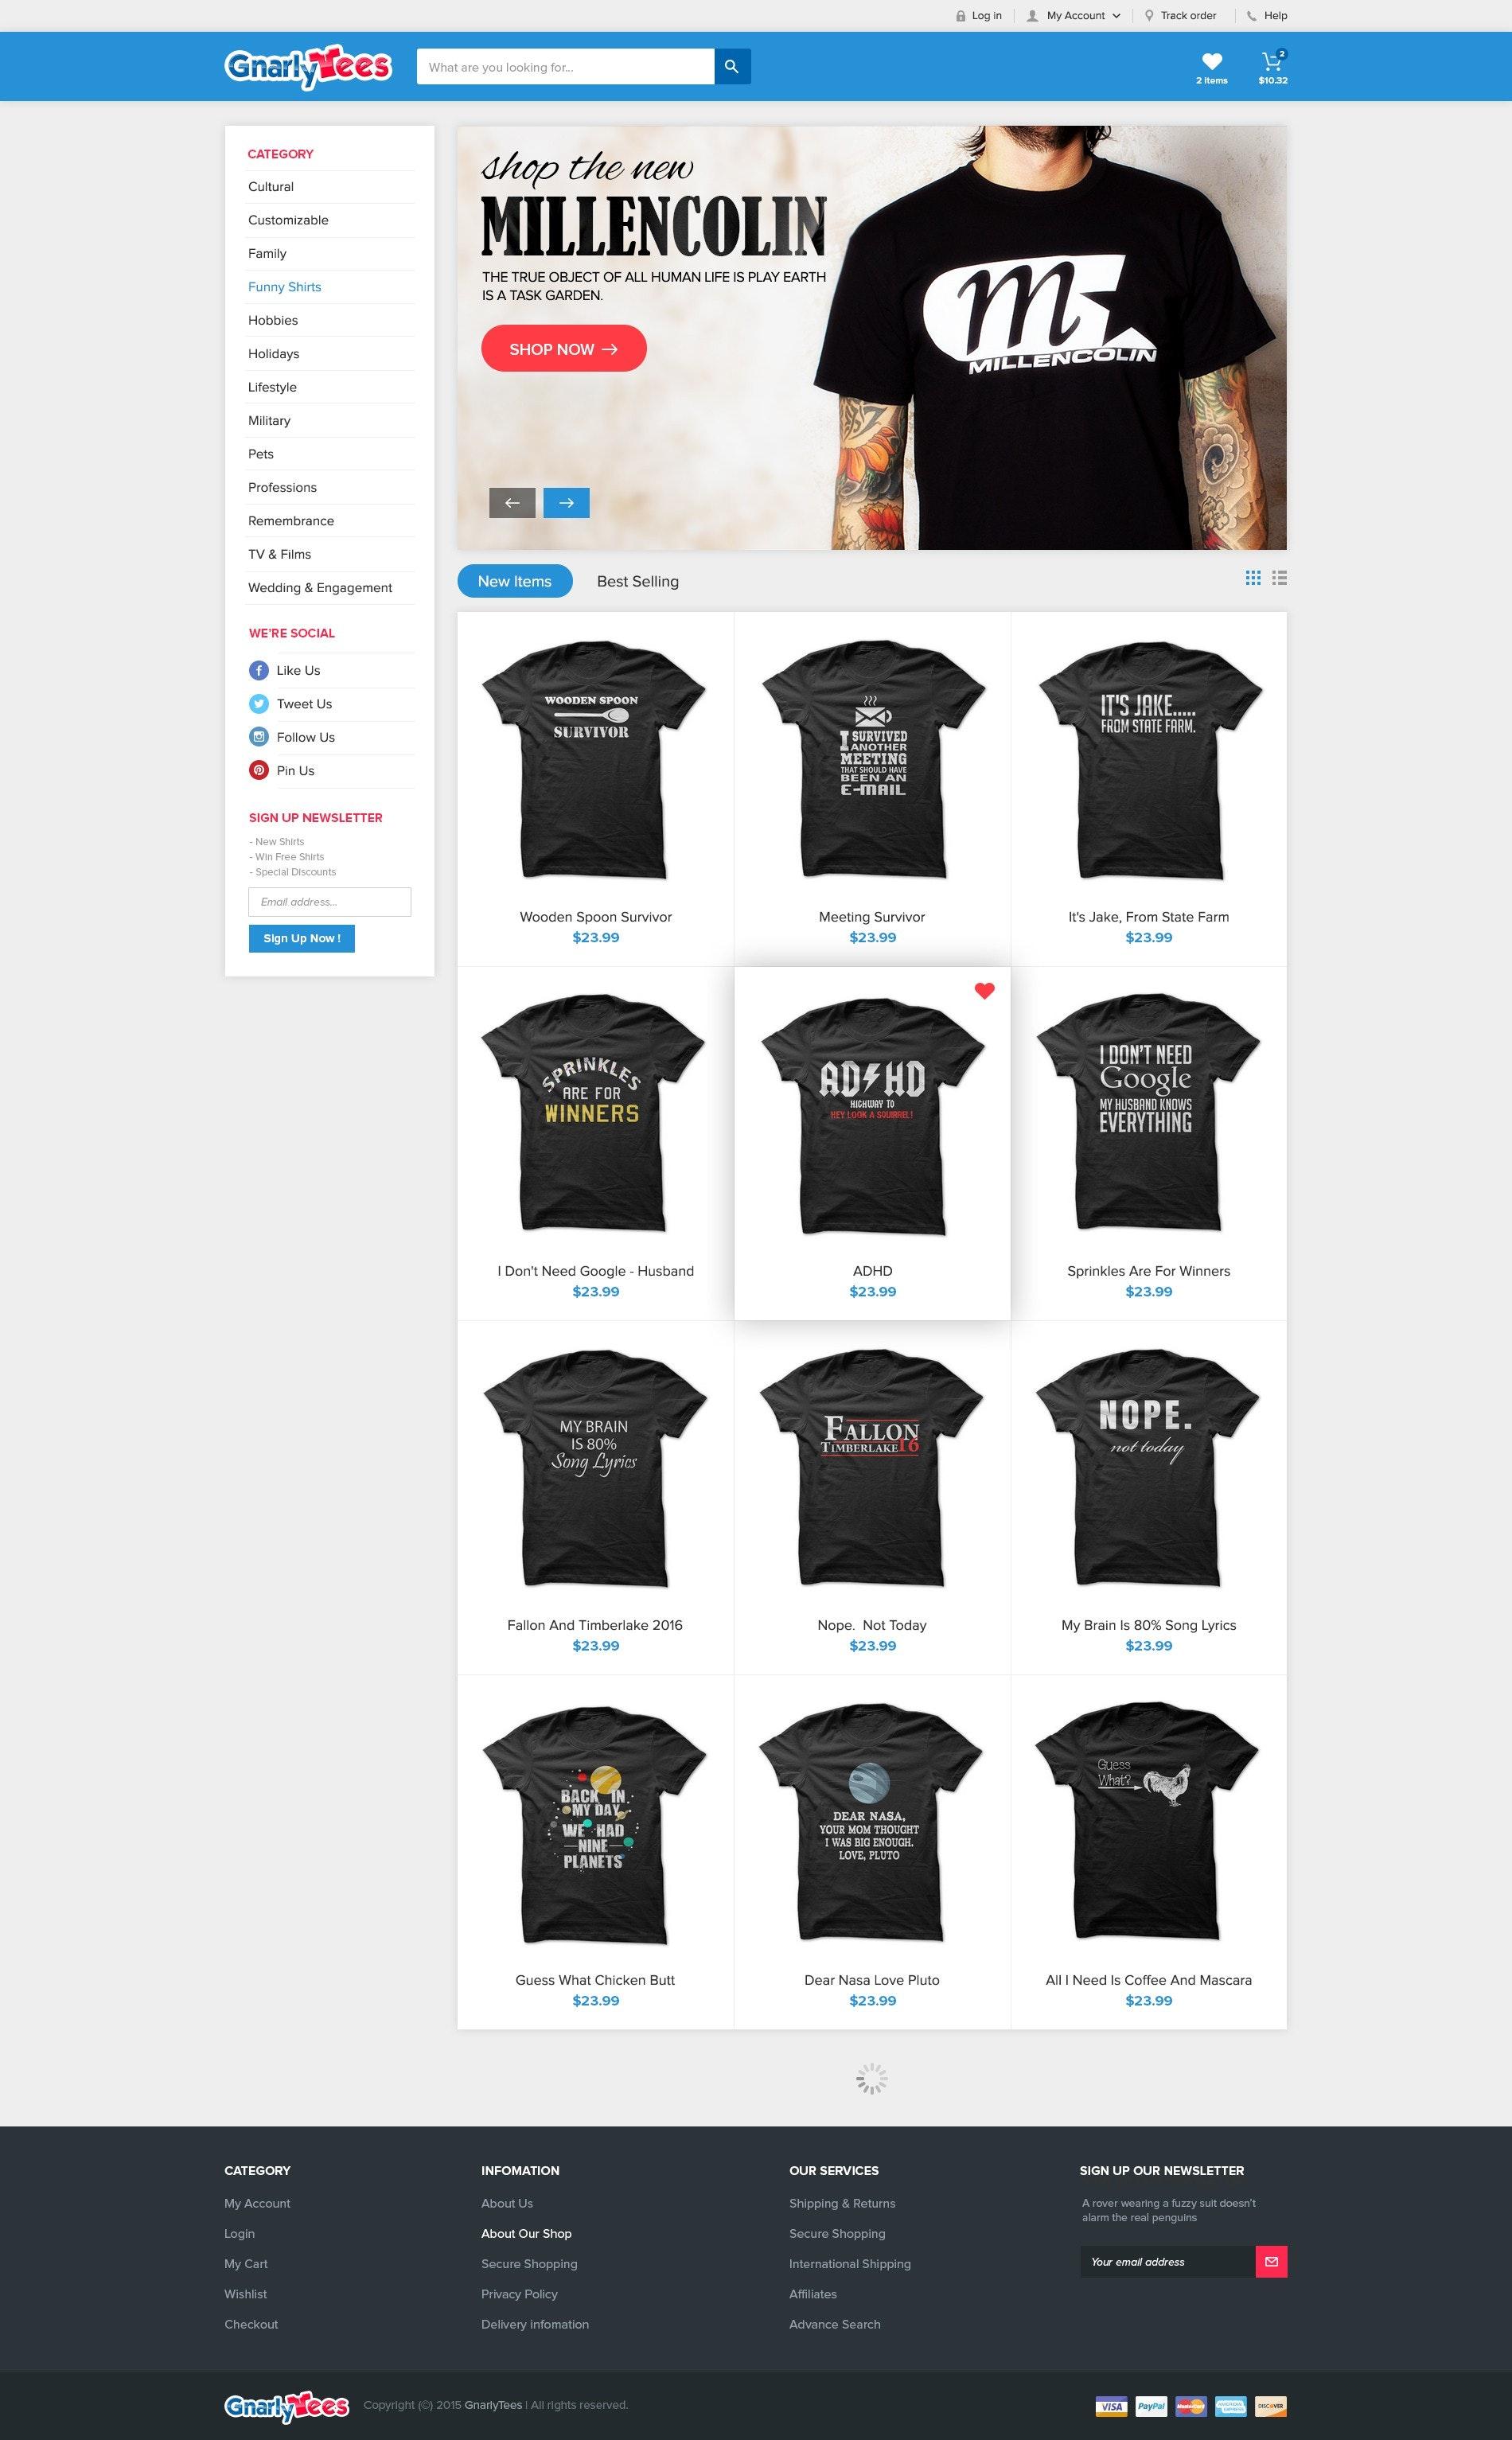 Gnarly Tees website design